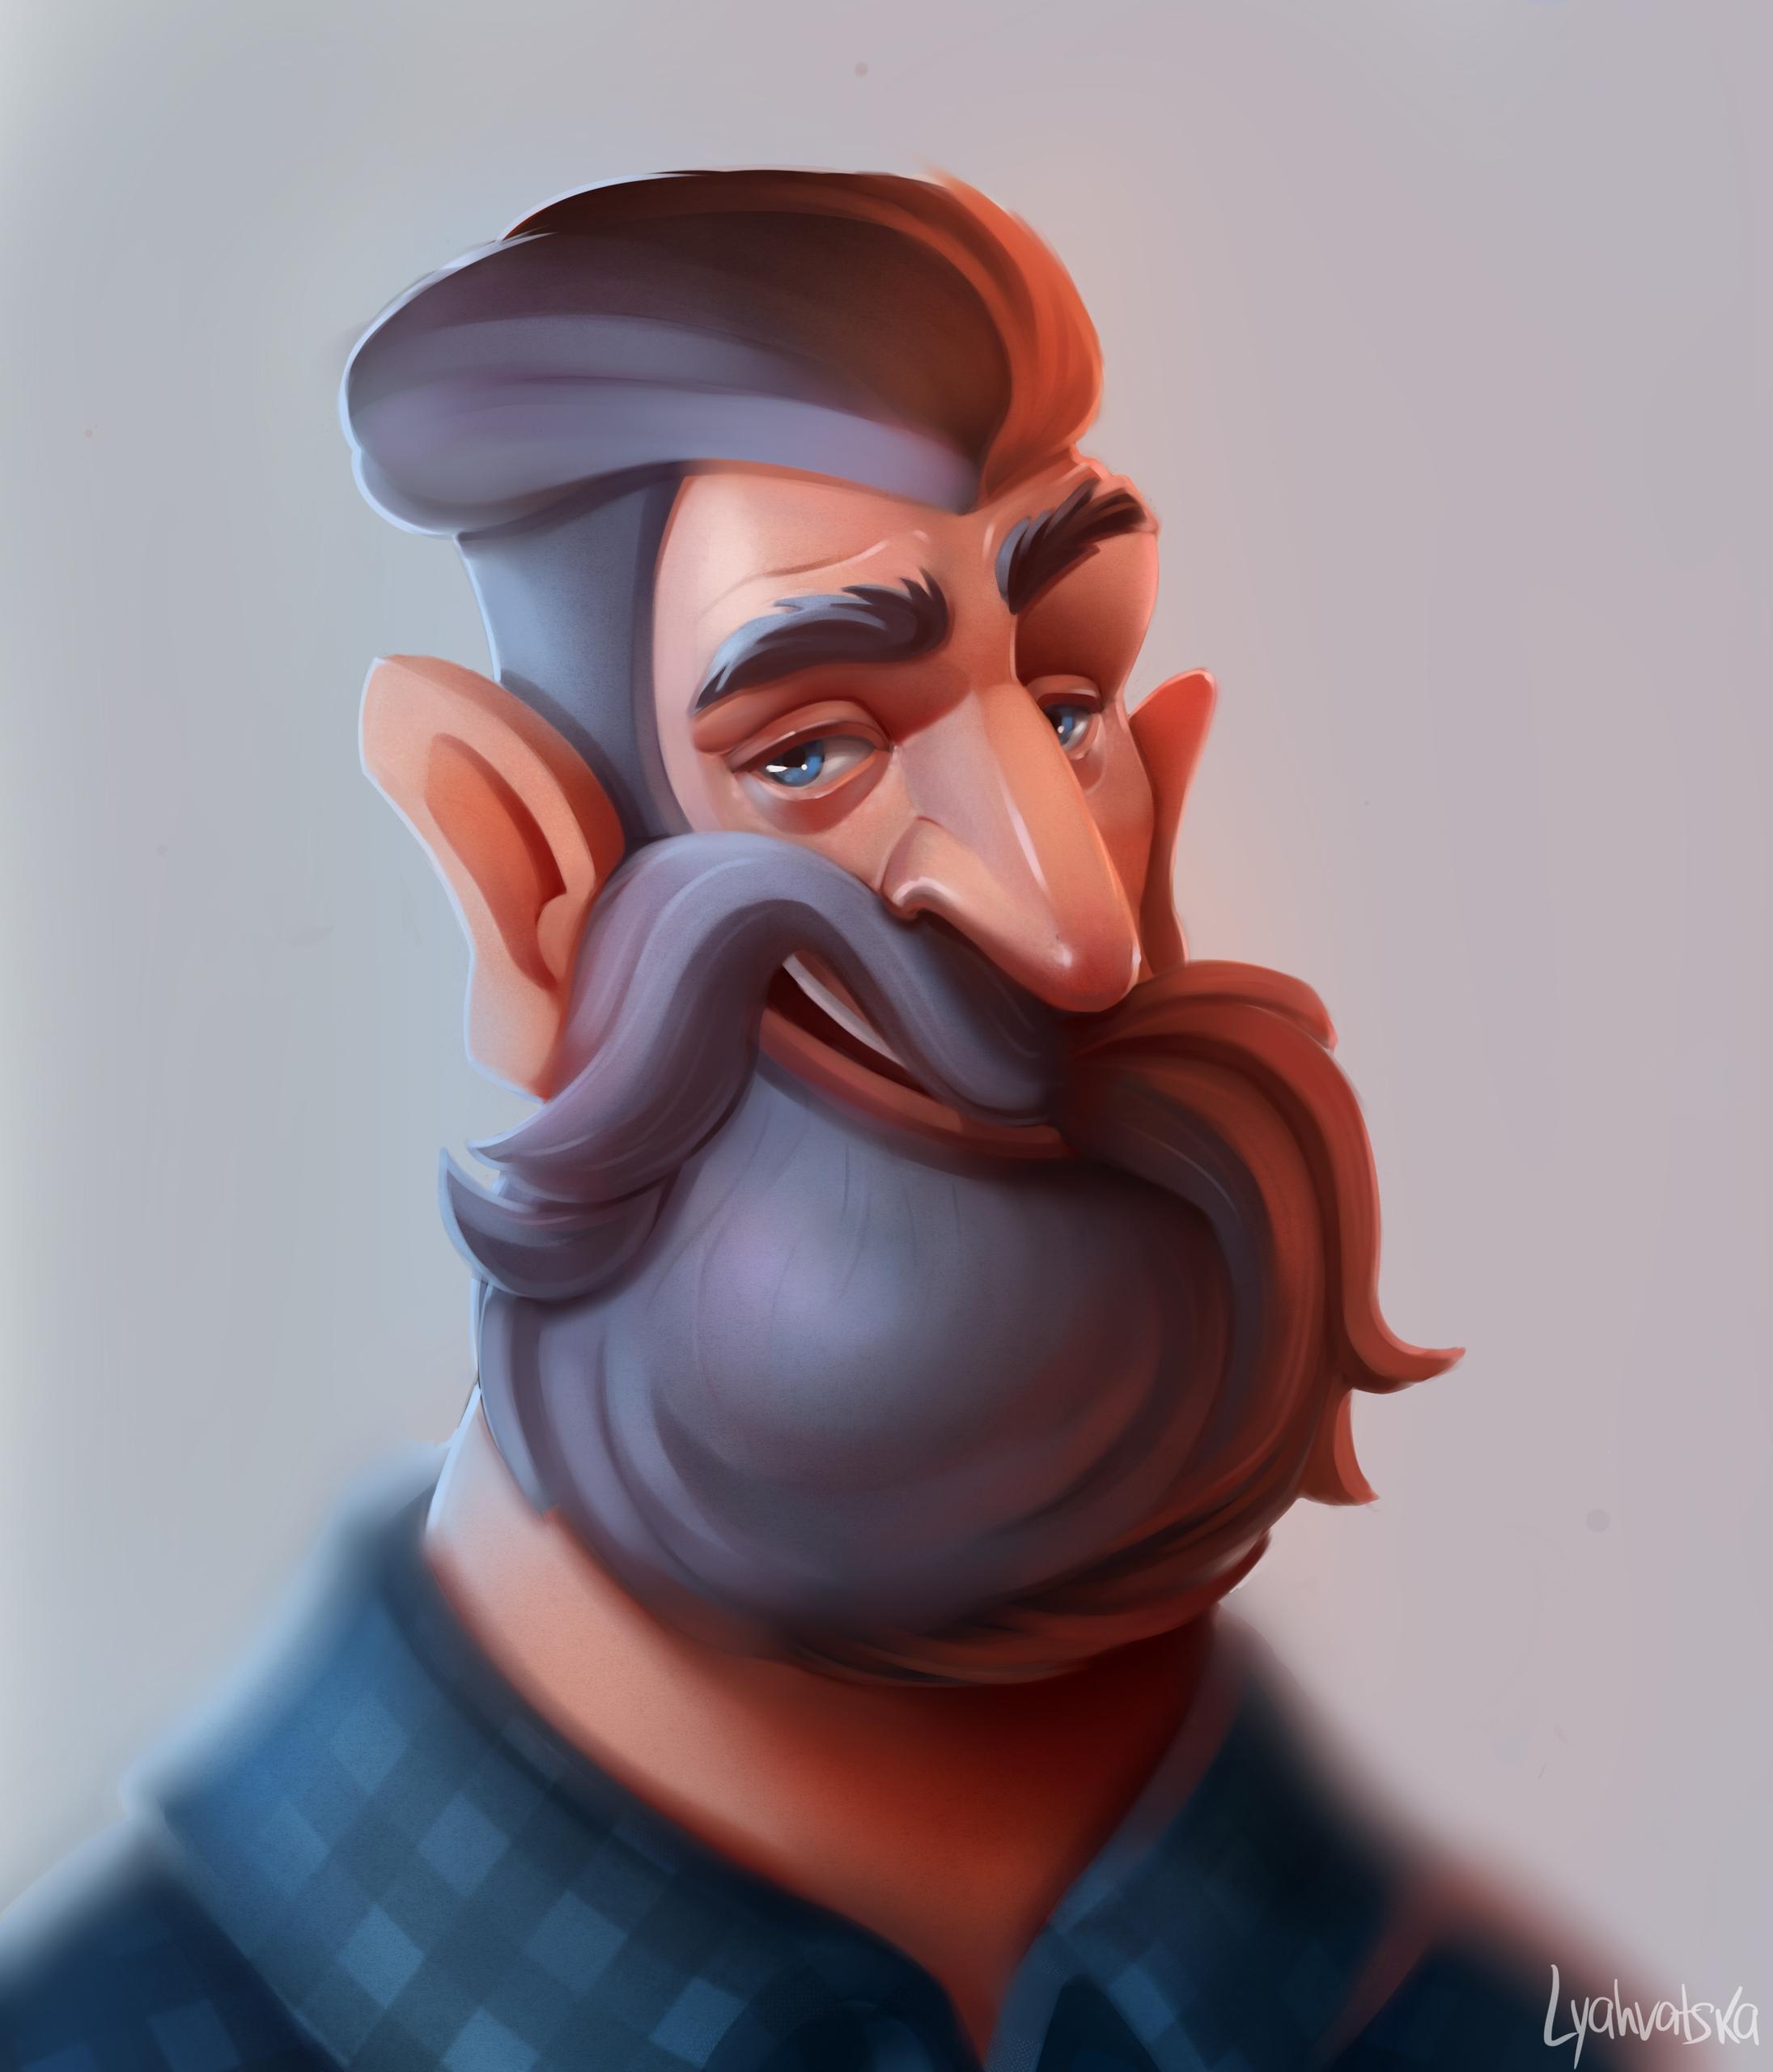 characterdesign, character, conceptart - natalialyahvatska | ello